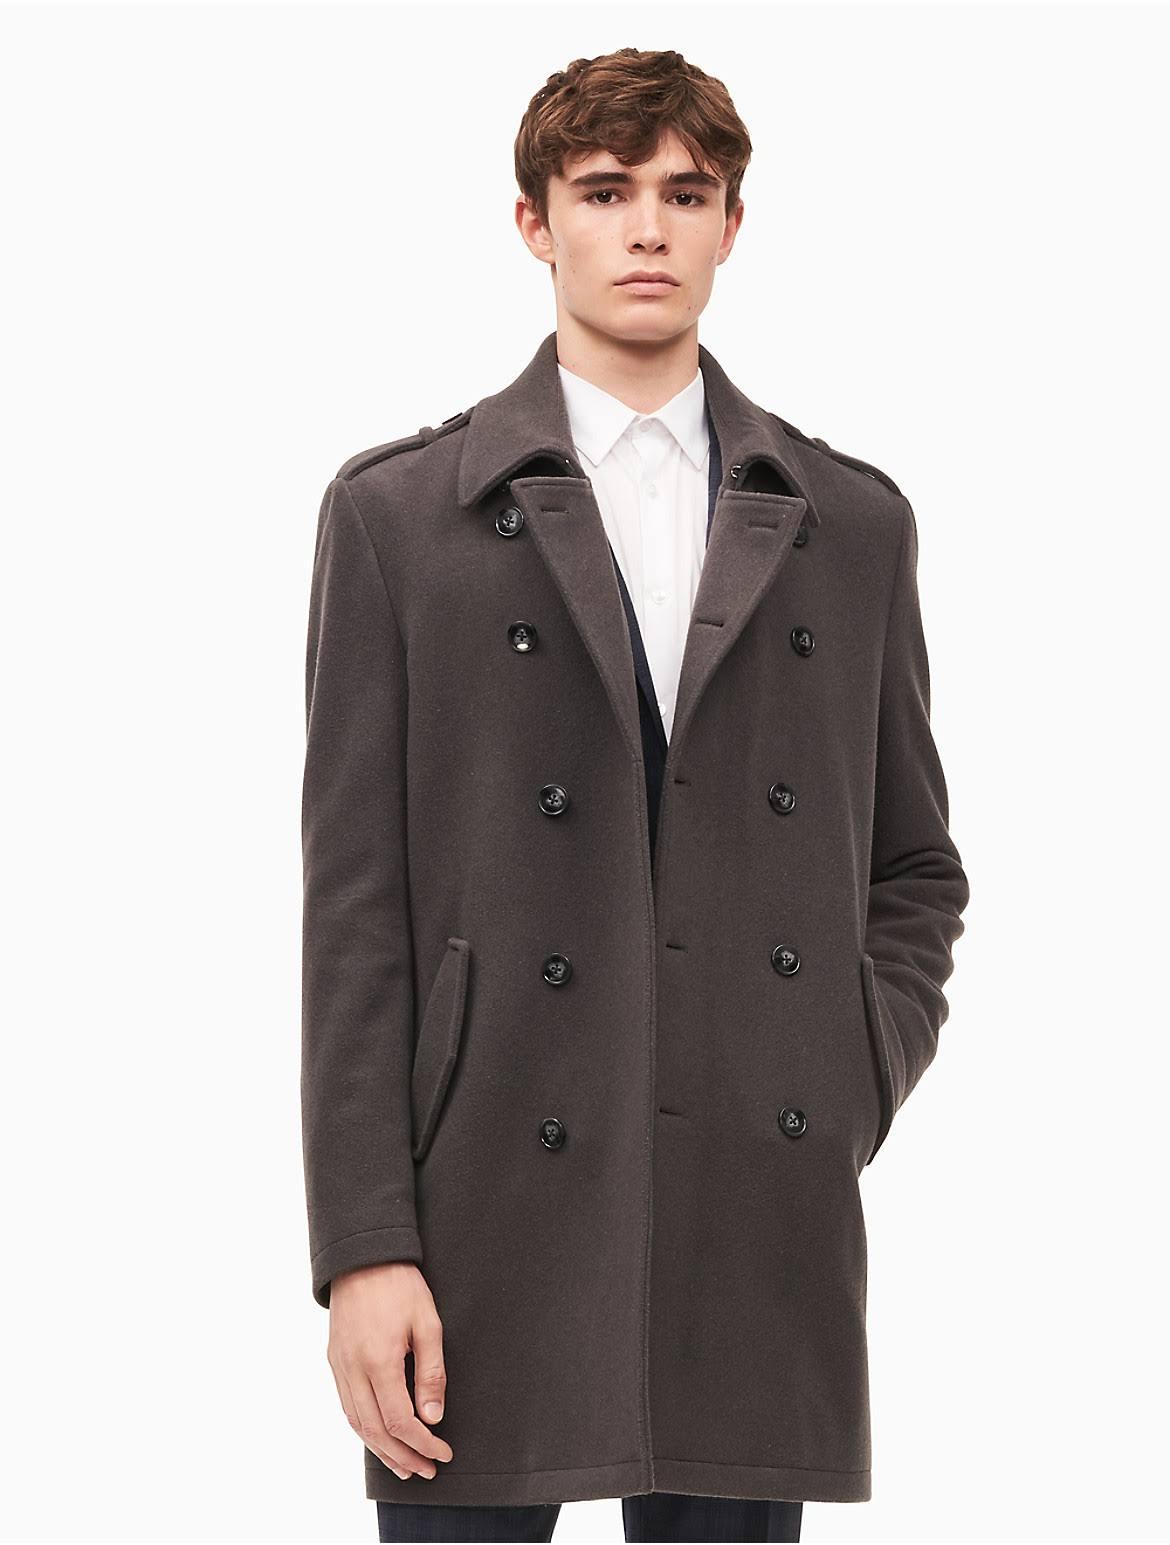 Klein Coats Double Calvin Meade Top Grauer Herren unvergleichlich Körper Breasted 7wpqqSdO1x